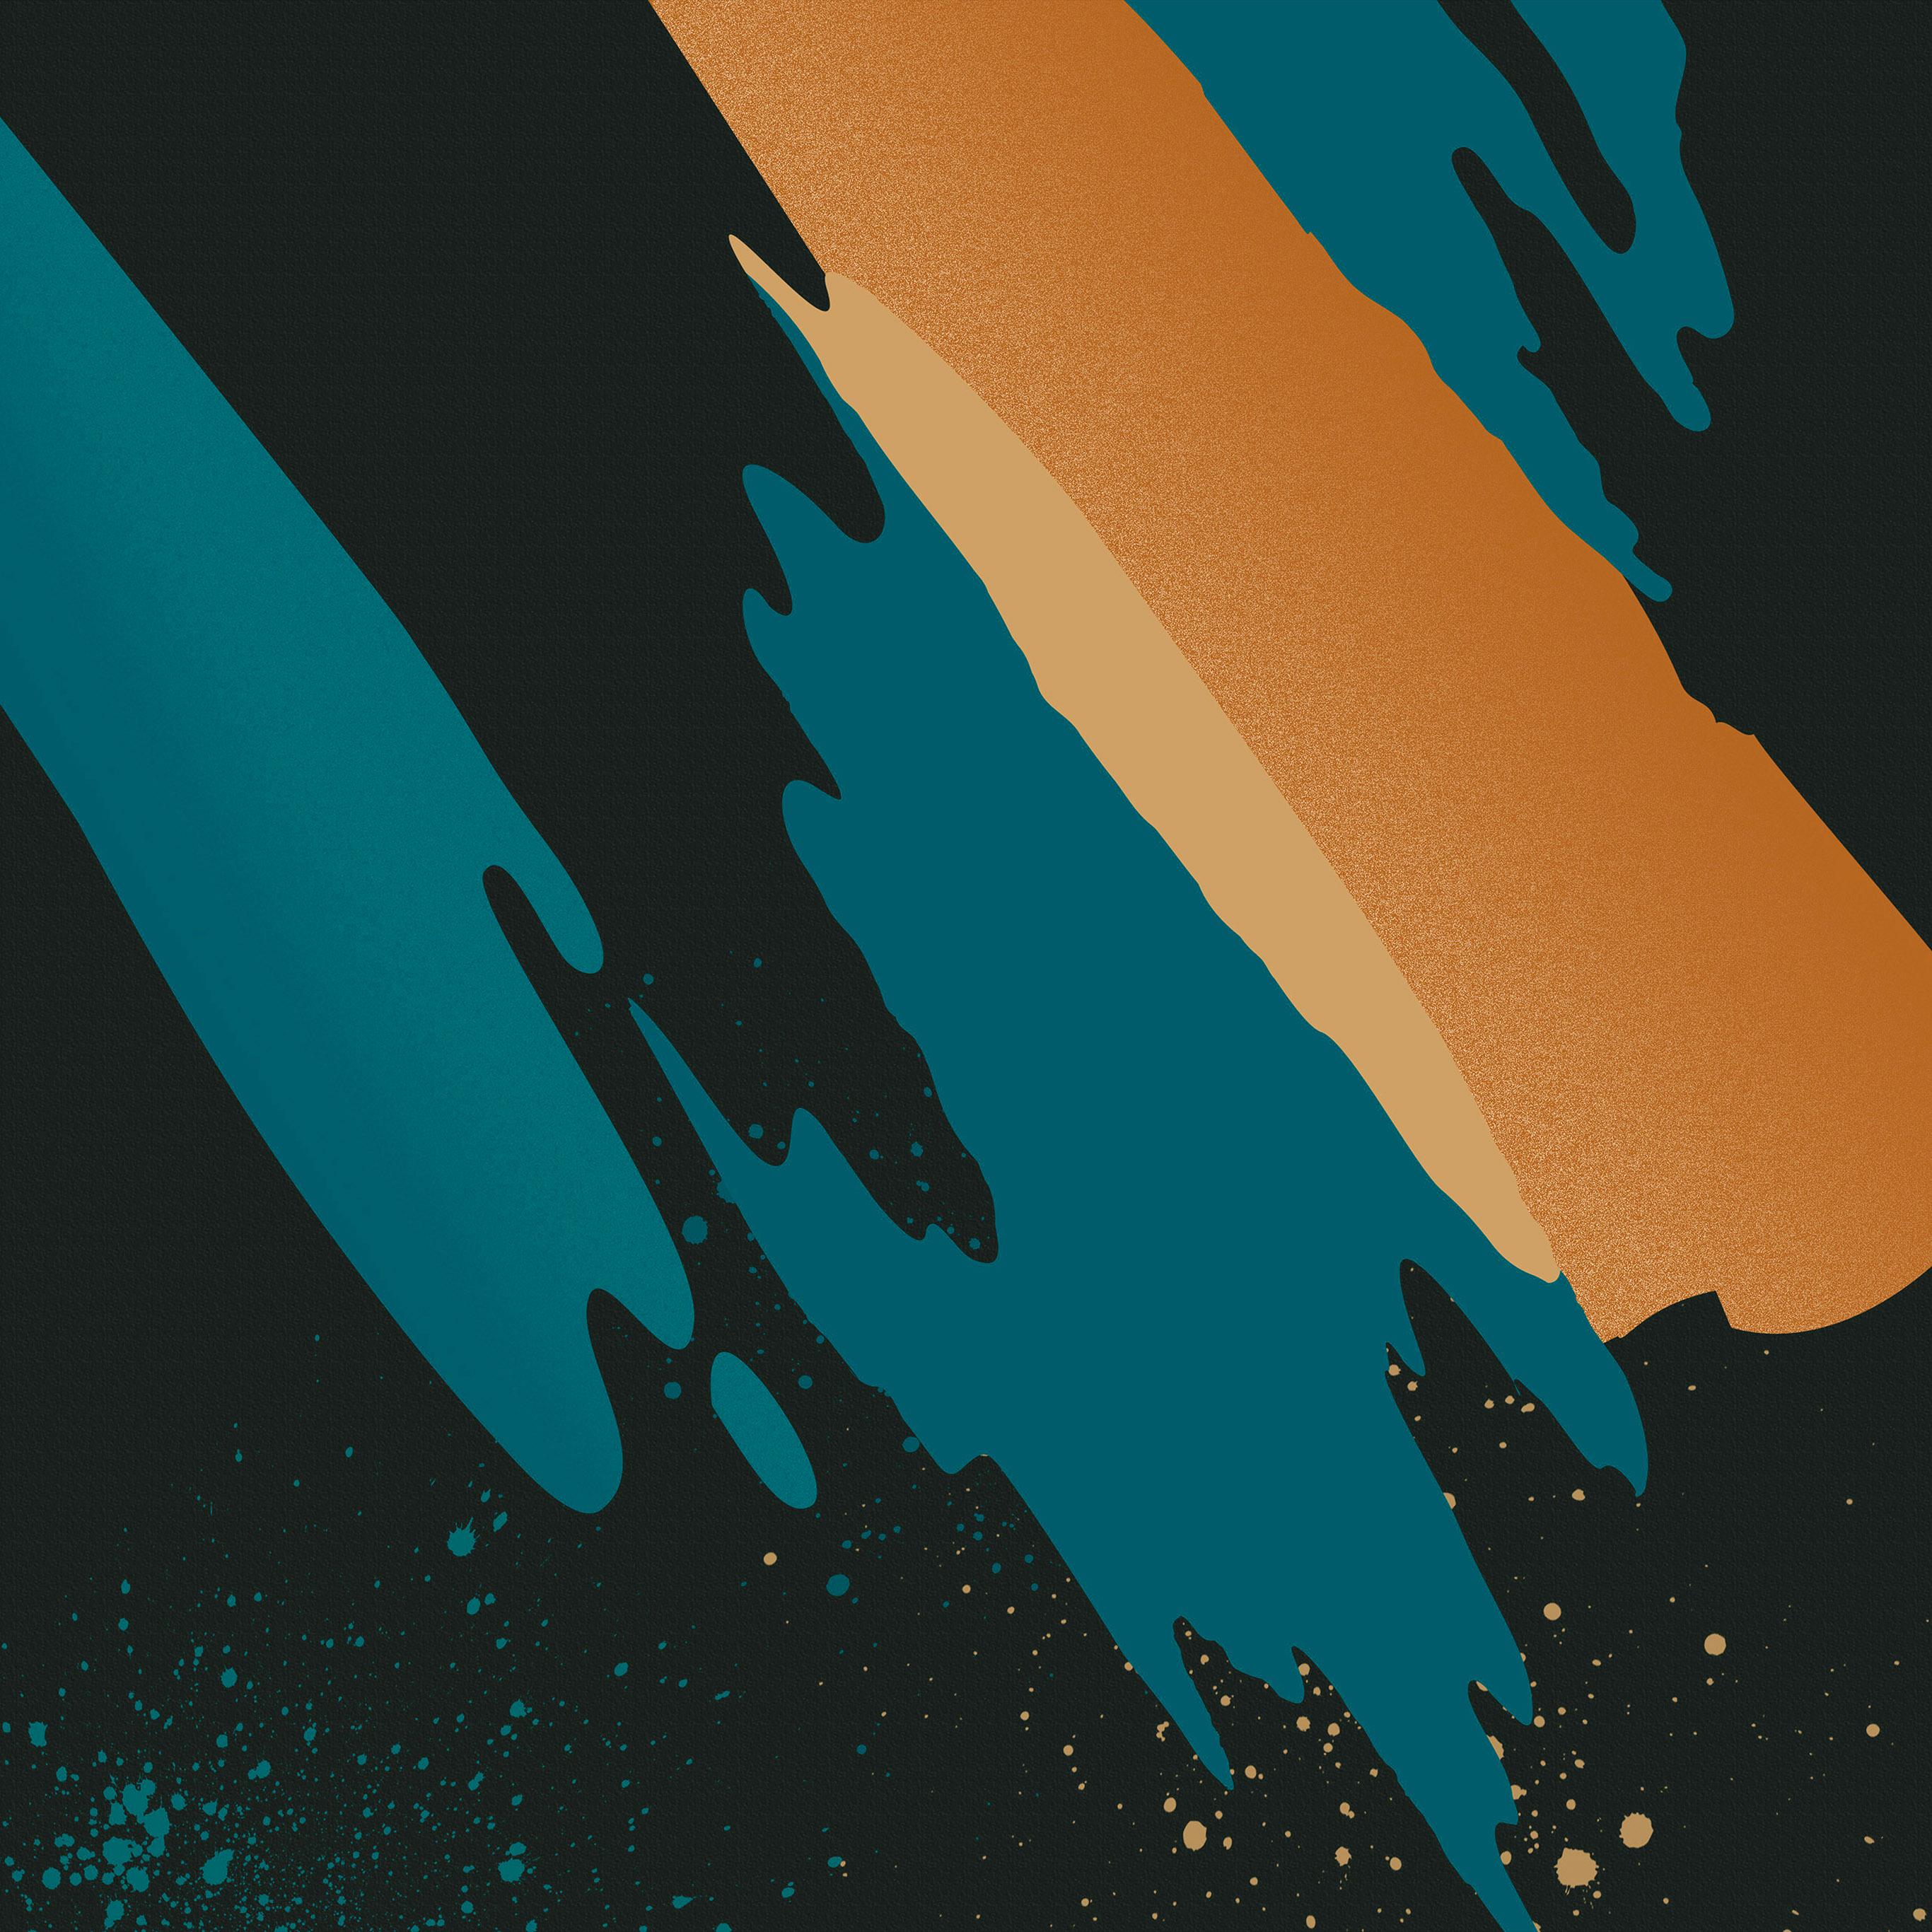 Vs22 Paint Abstract Background Htc Dark Orange Blue Pattern